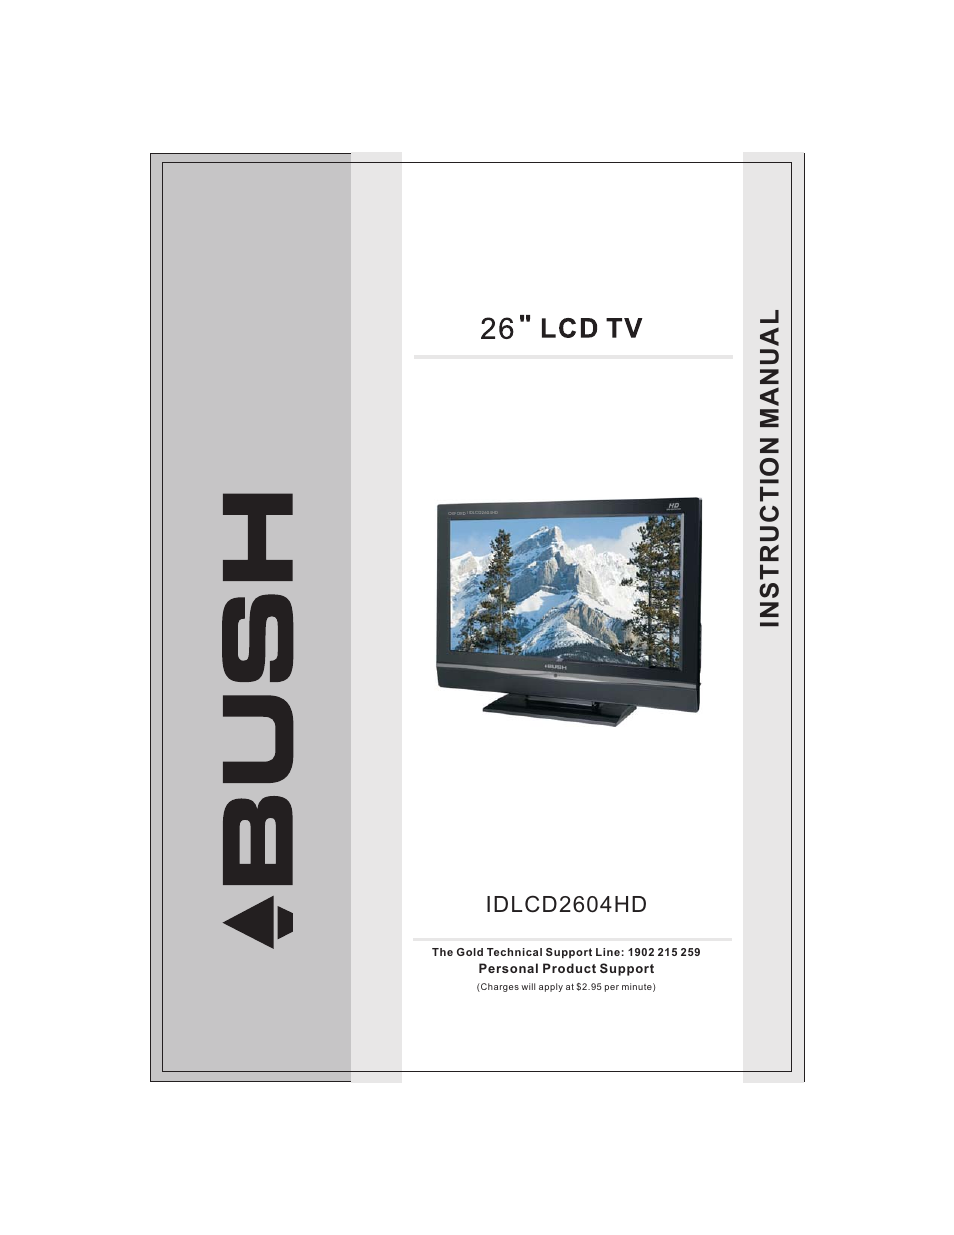 bush 26 lcd tv idlcd2604hd user manual 24 pages rh manualsdir com bush tv led40127fhdcntd user manual bush lcd tv instruction manual